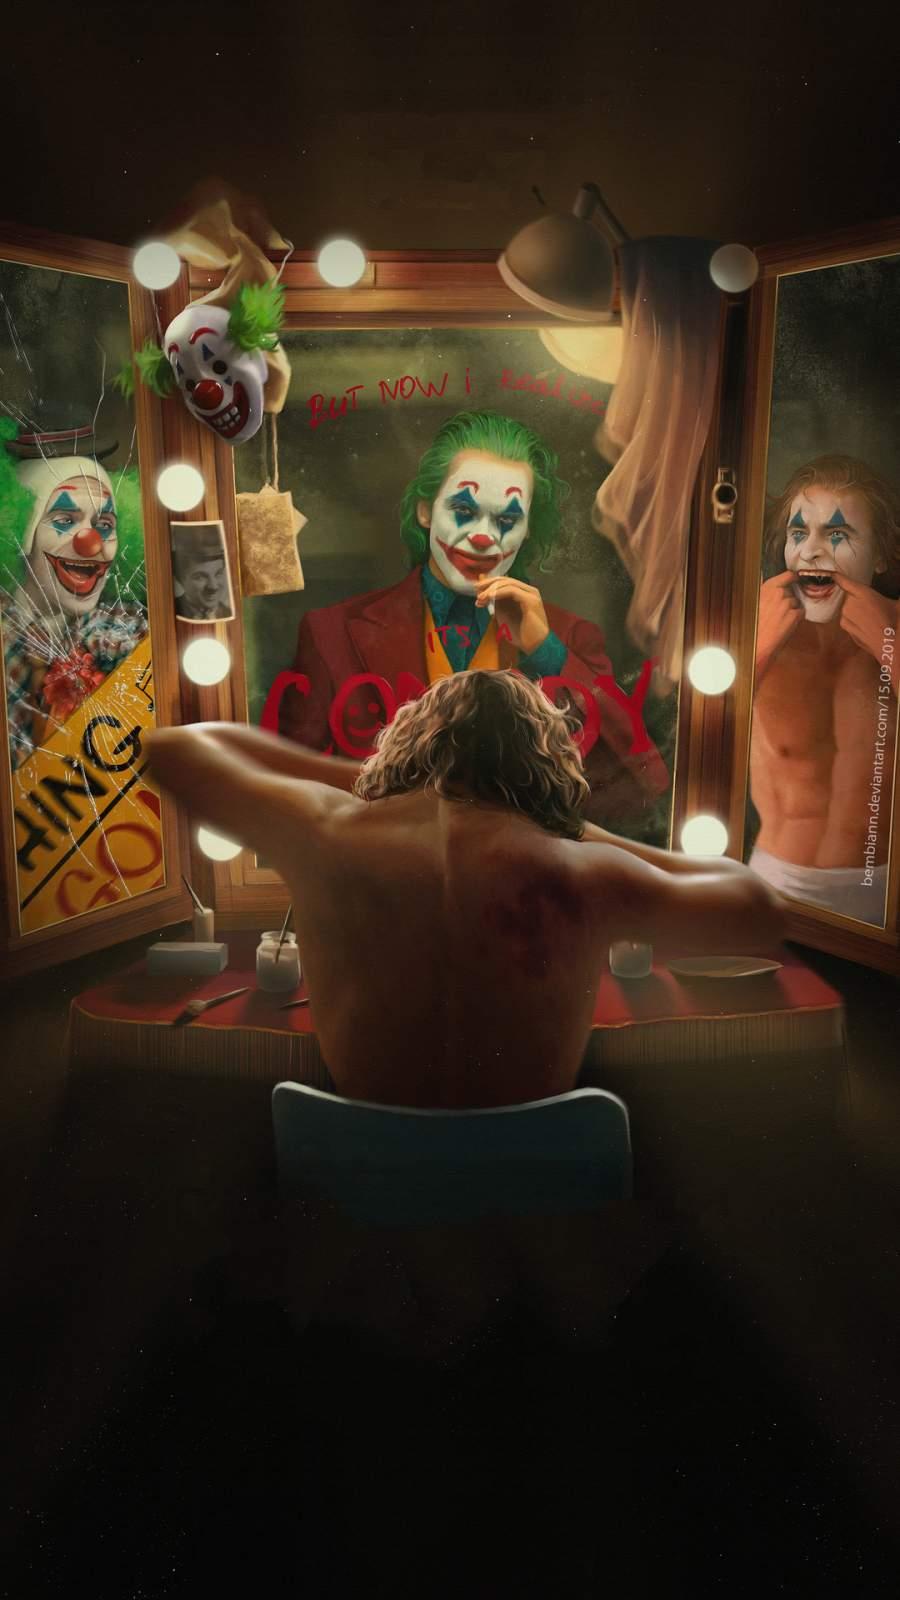 Joker 4K iPhone Wallpaper